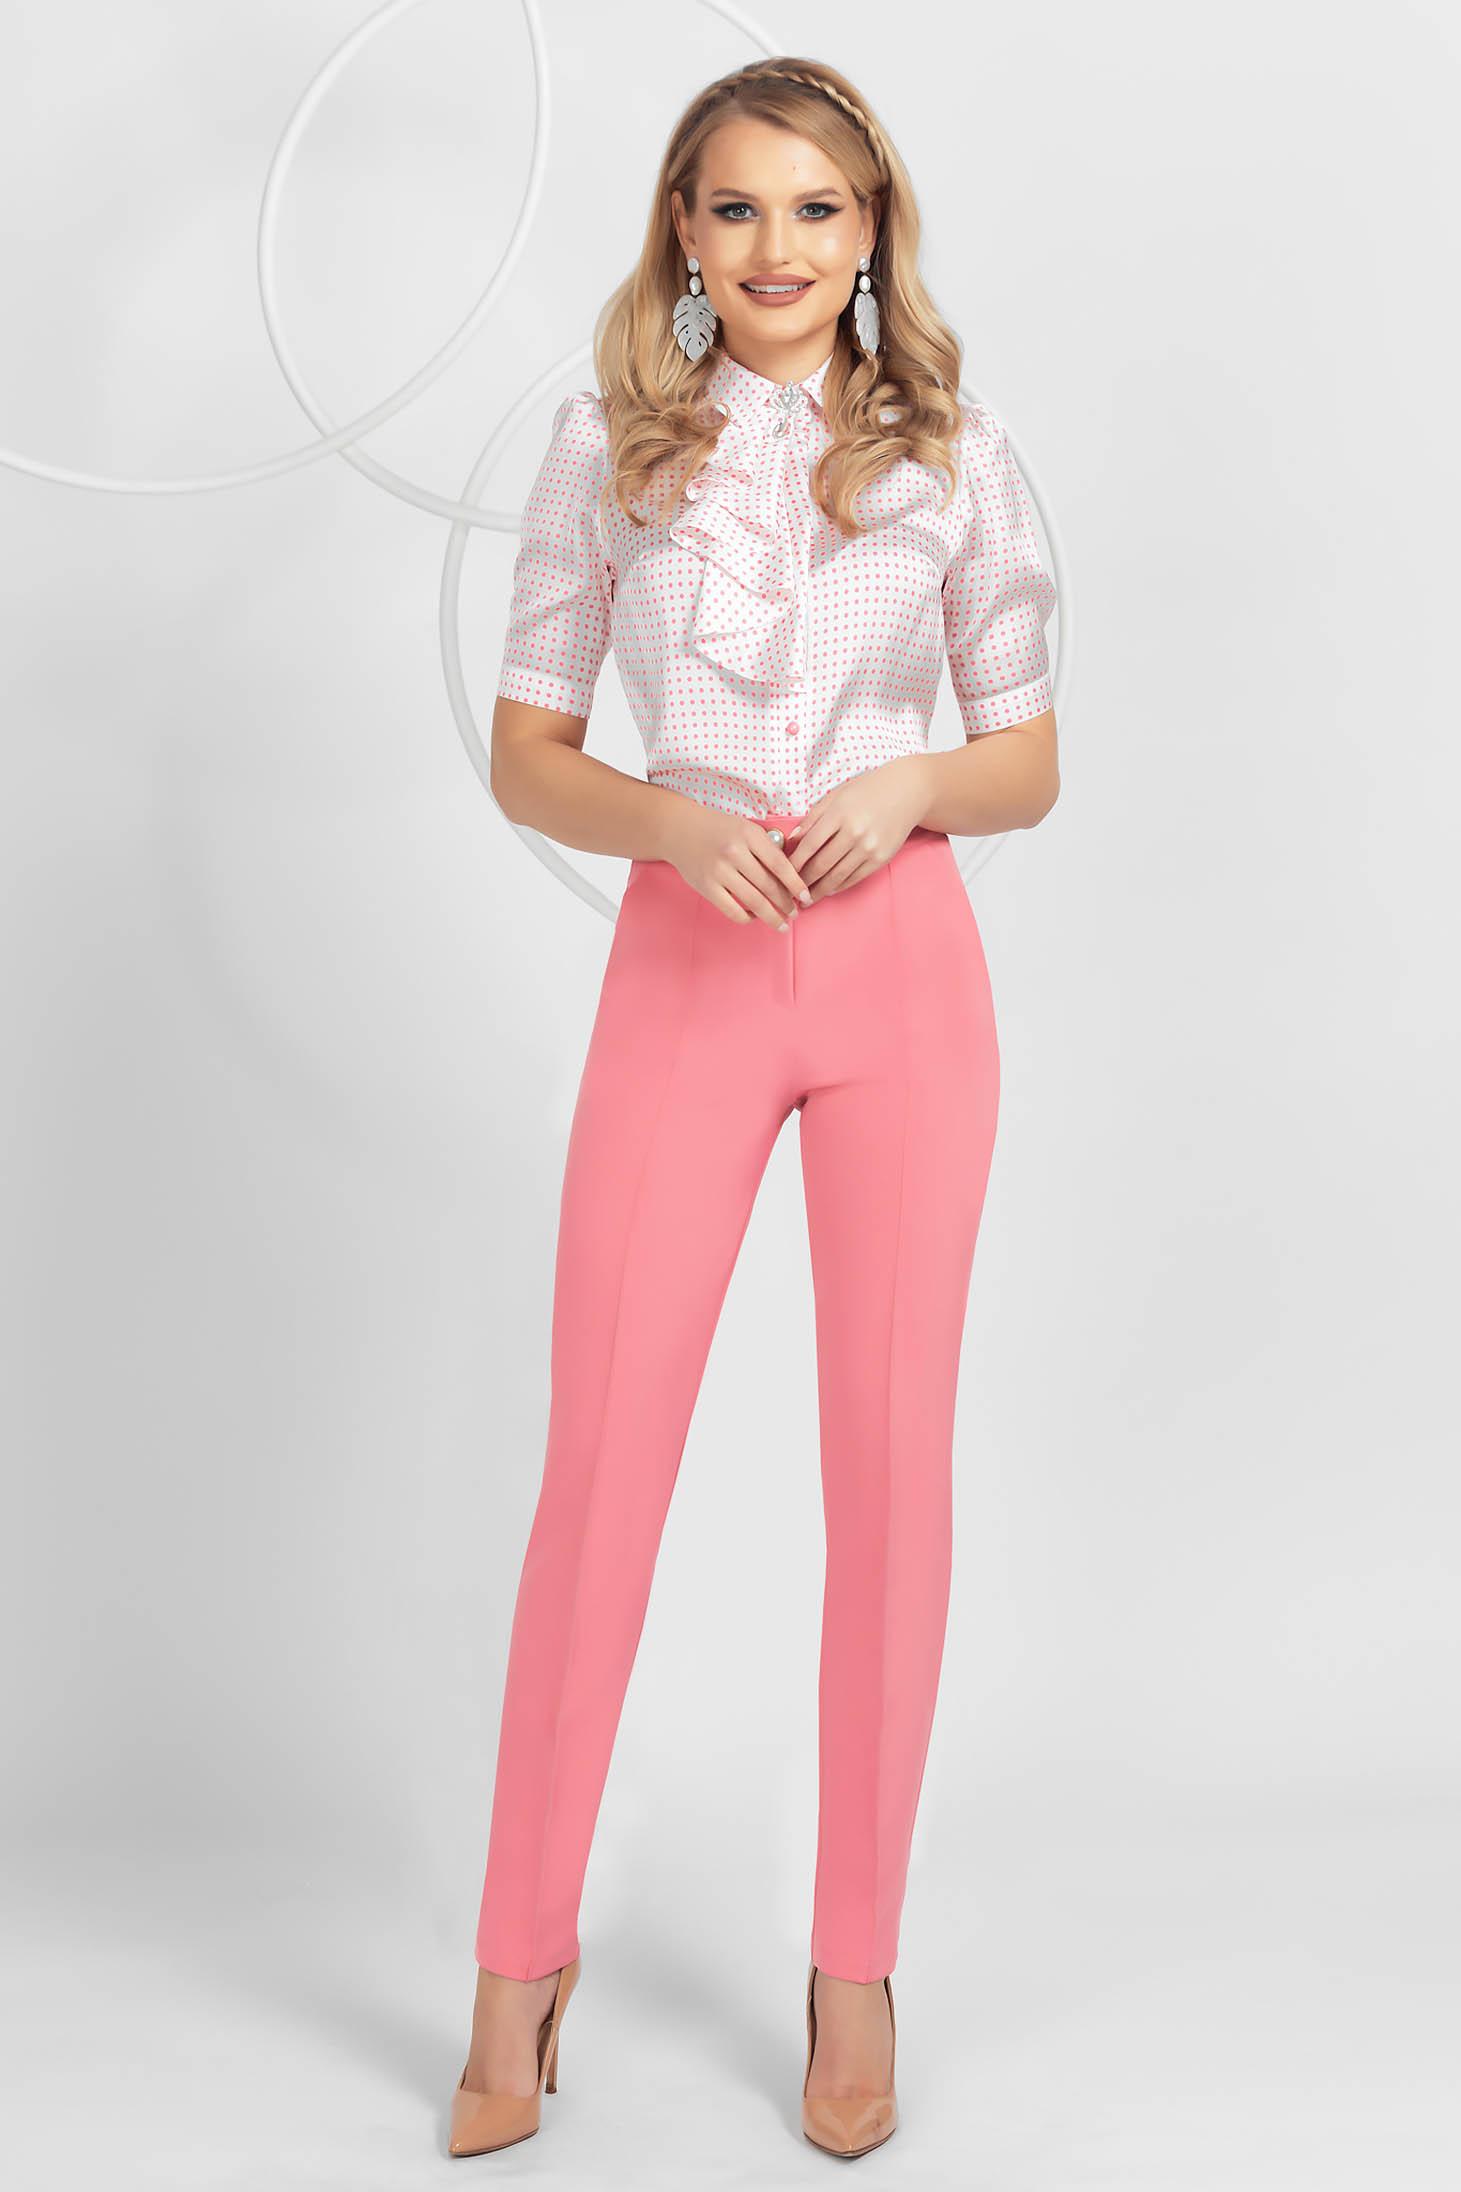 Pink trousers conical medium waist slightly elastic fabric